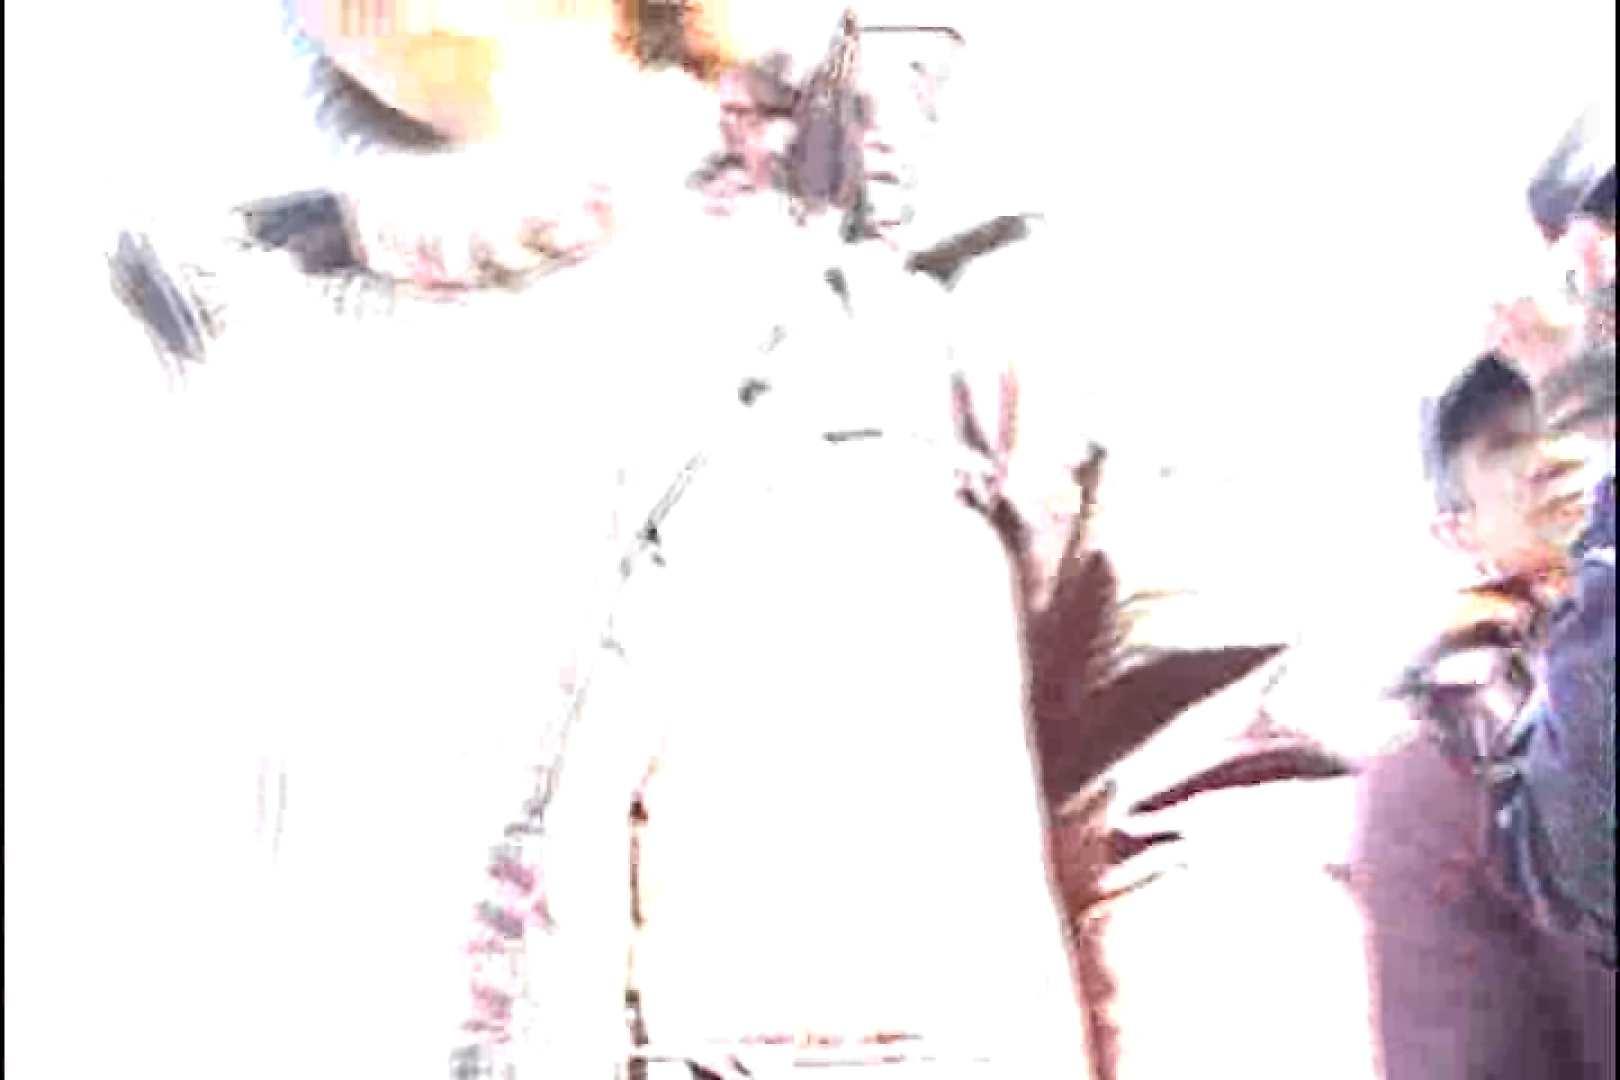 RQカメラ地獄Vol.11 レースクイーン  57画像 14